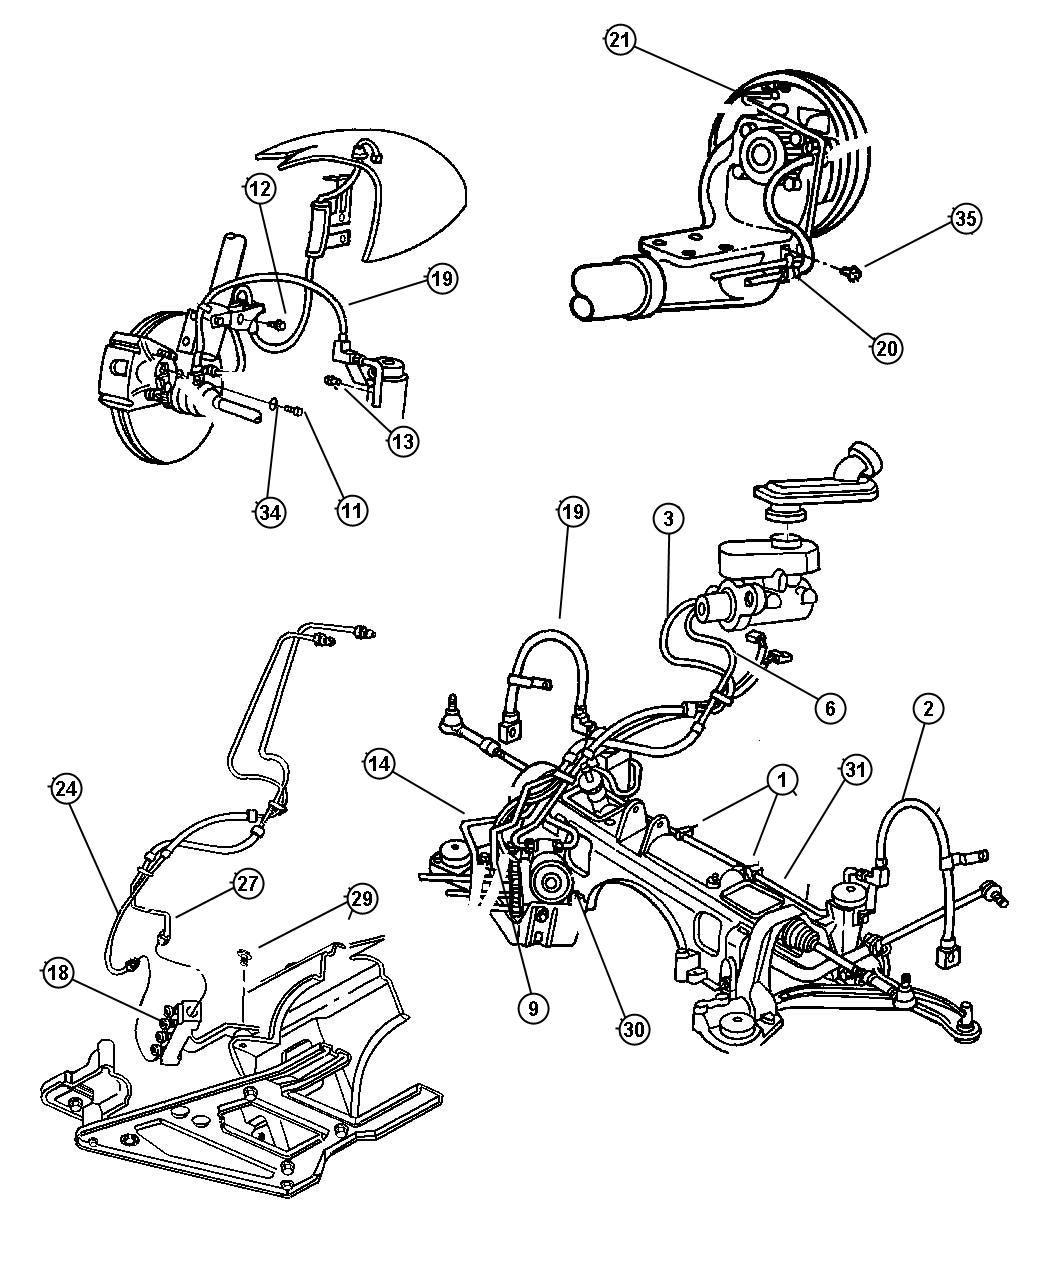 2000 Dodge Caravan Tube  Brake  Brake Master Cylinder  Master Cylinder To Hcu  Master